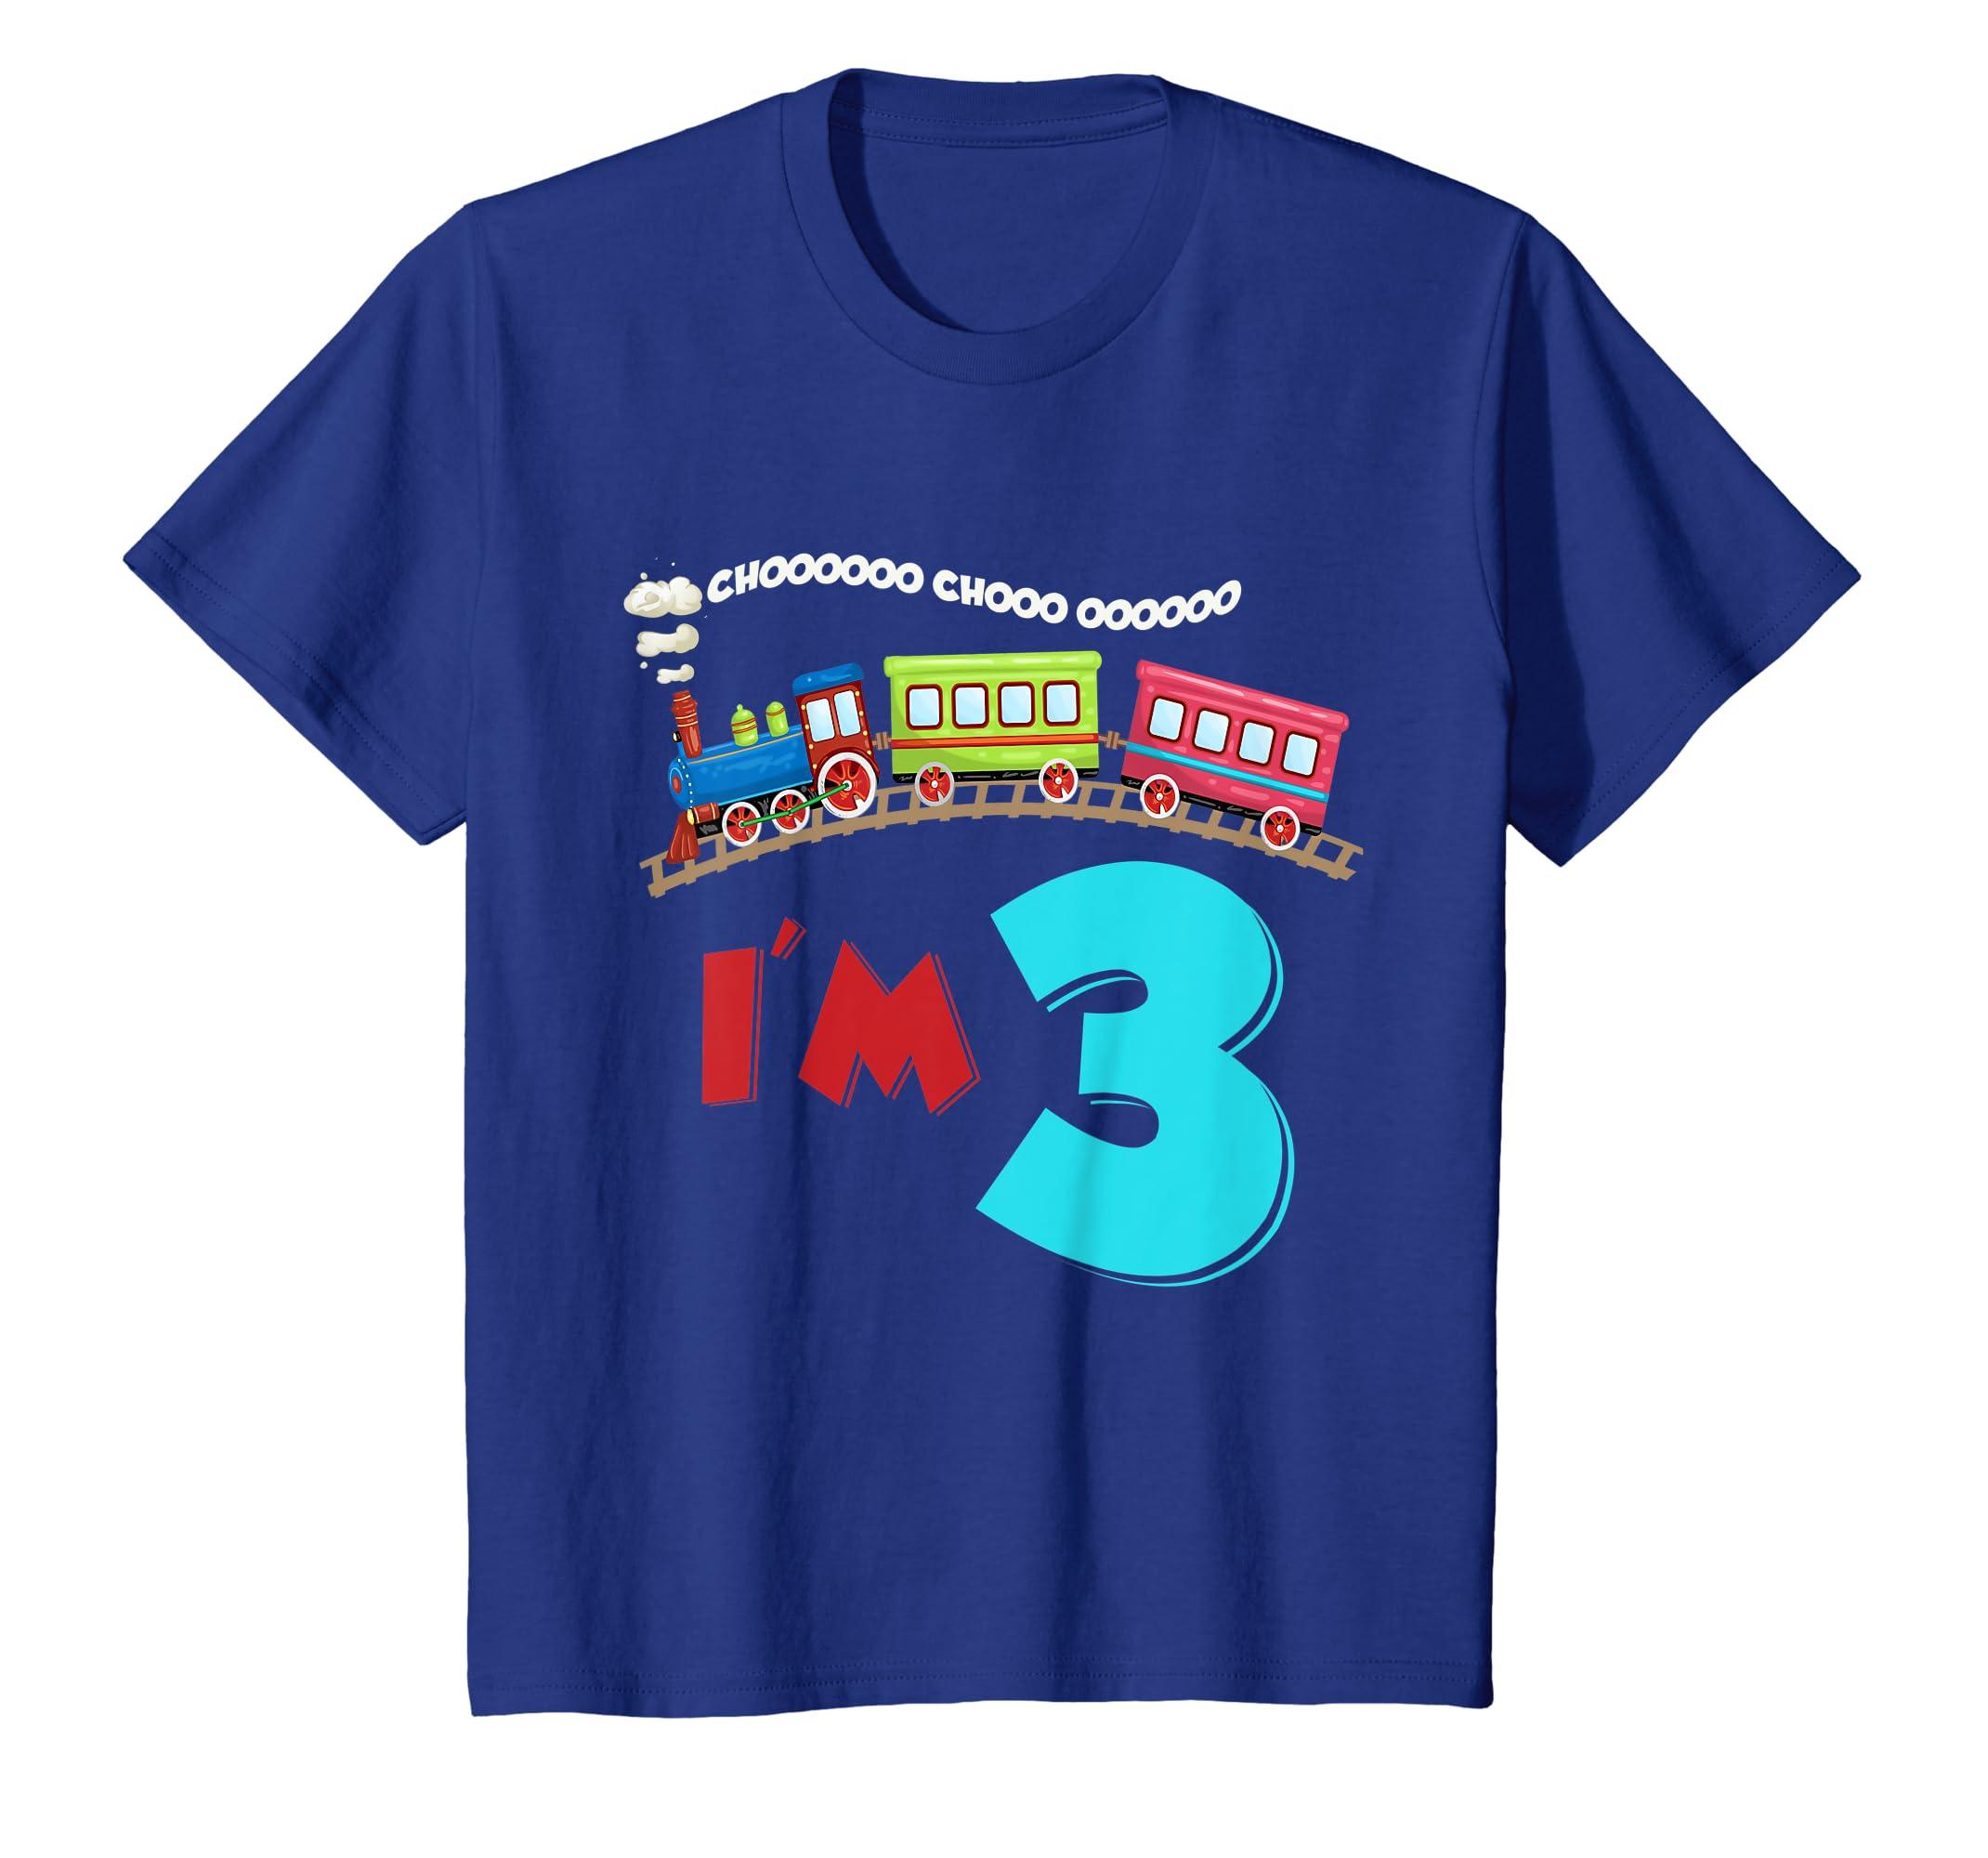 Amazon Kids 3 Years Old 3rd Birthday T Shirt